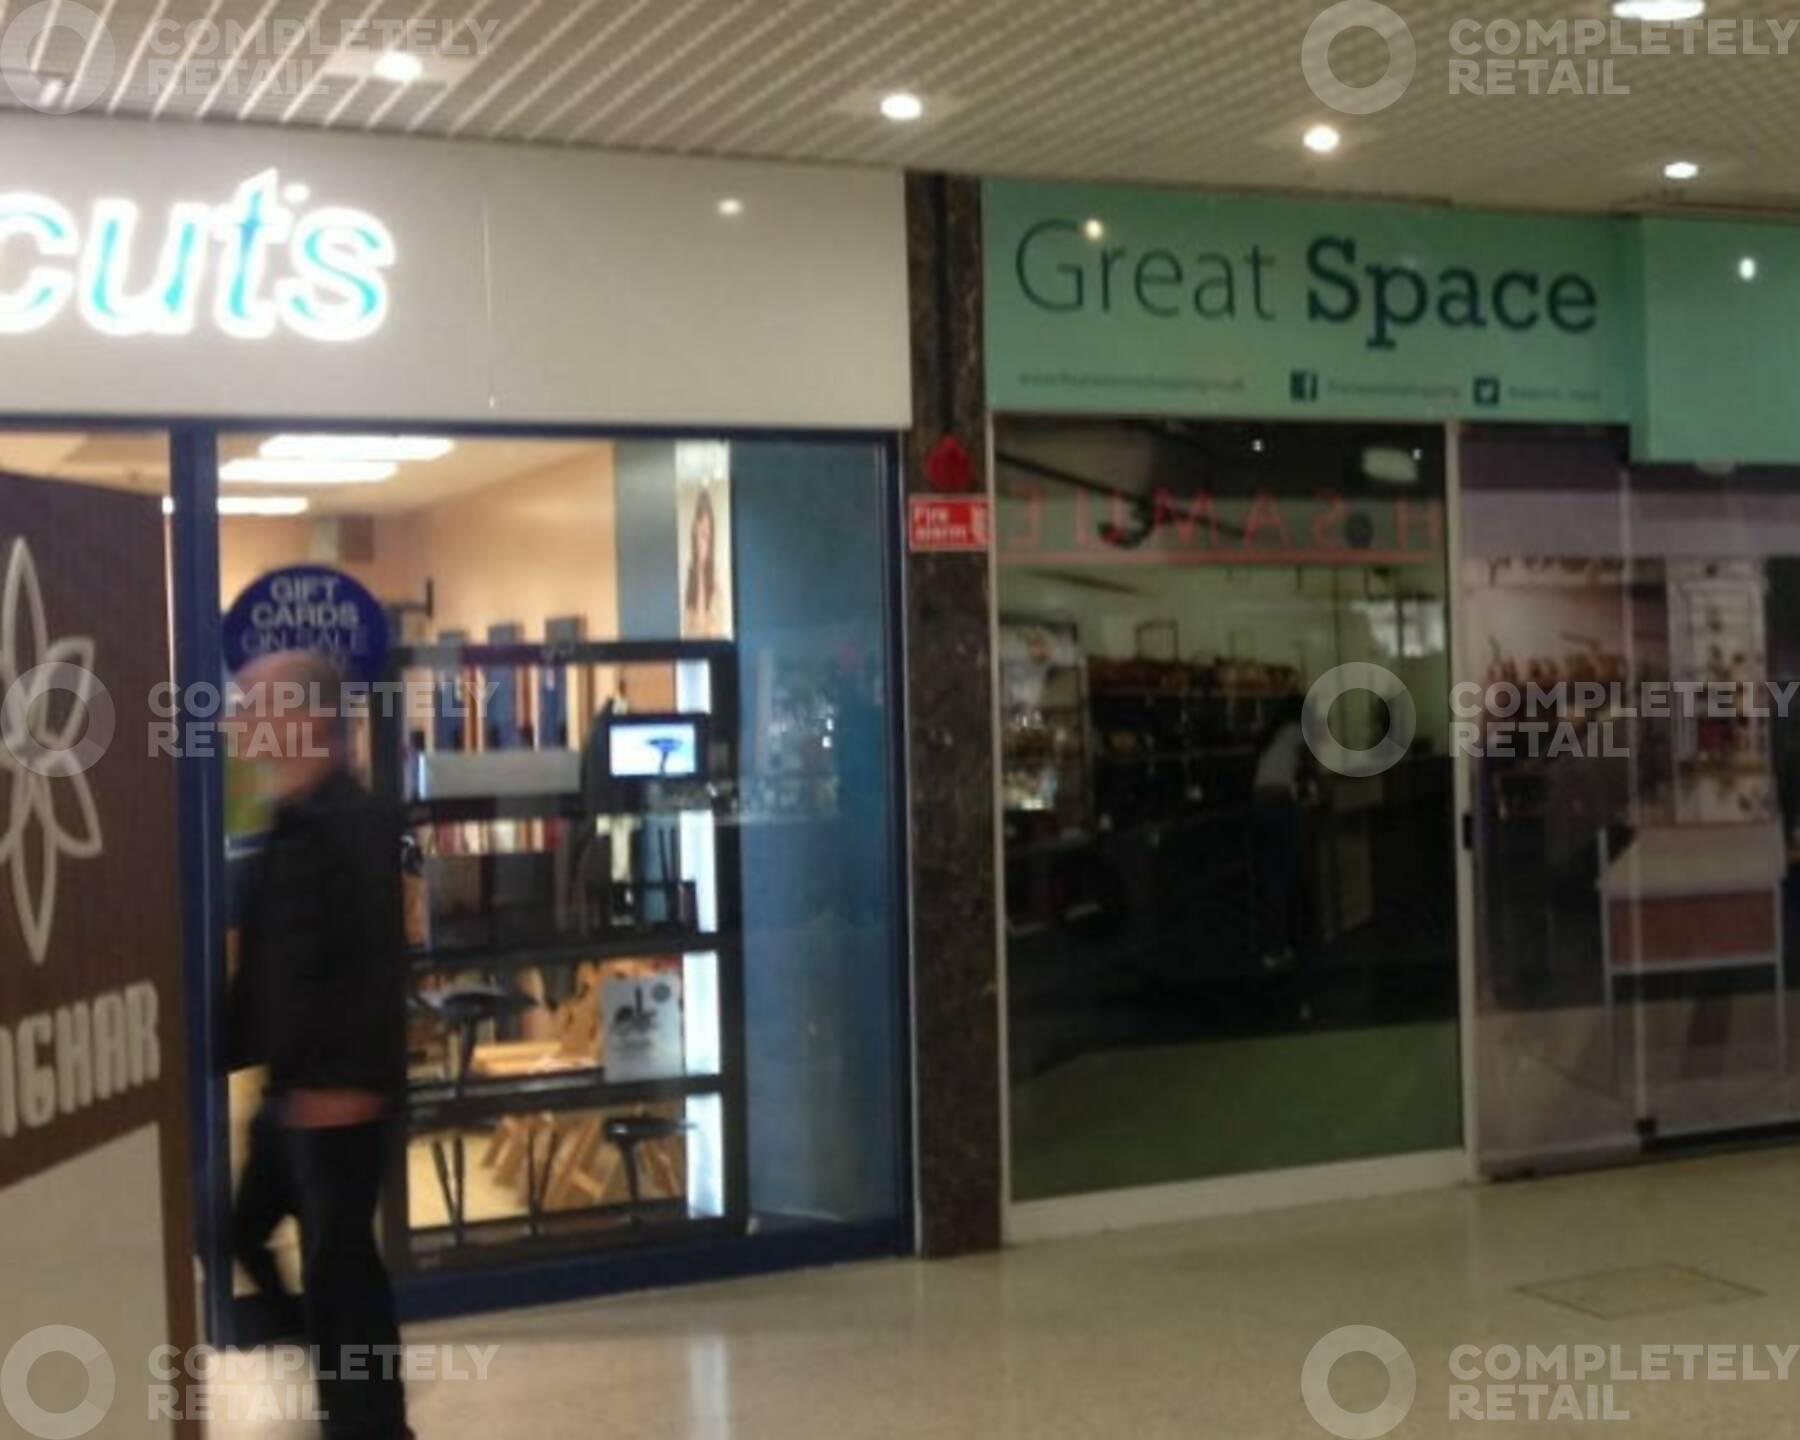 Unit 51, Four Seasons Shopping Centre